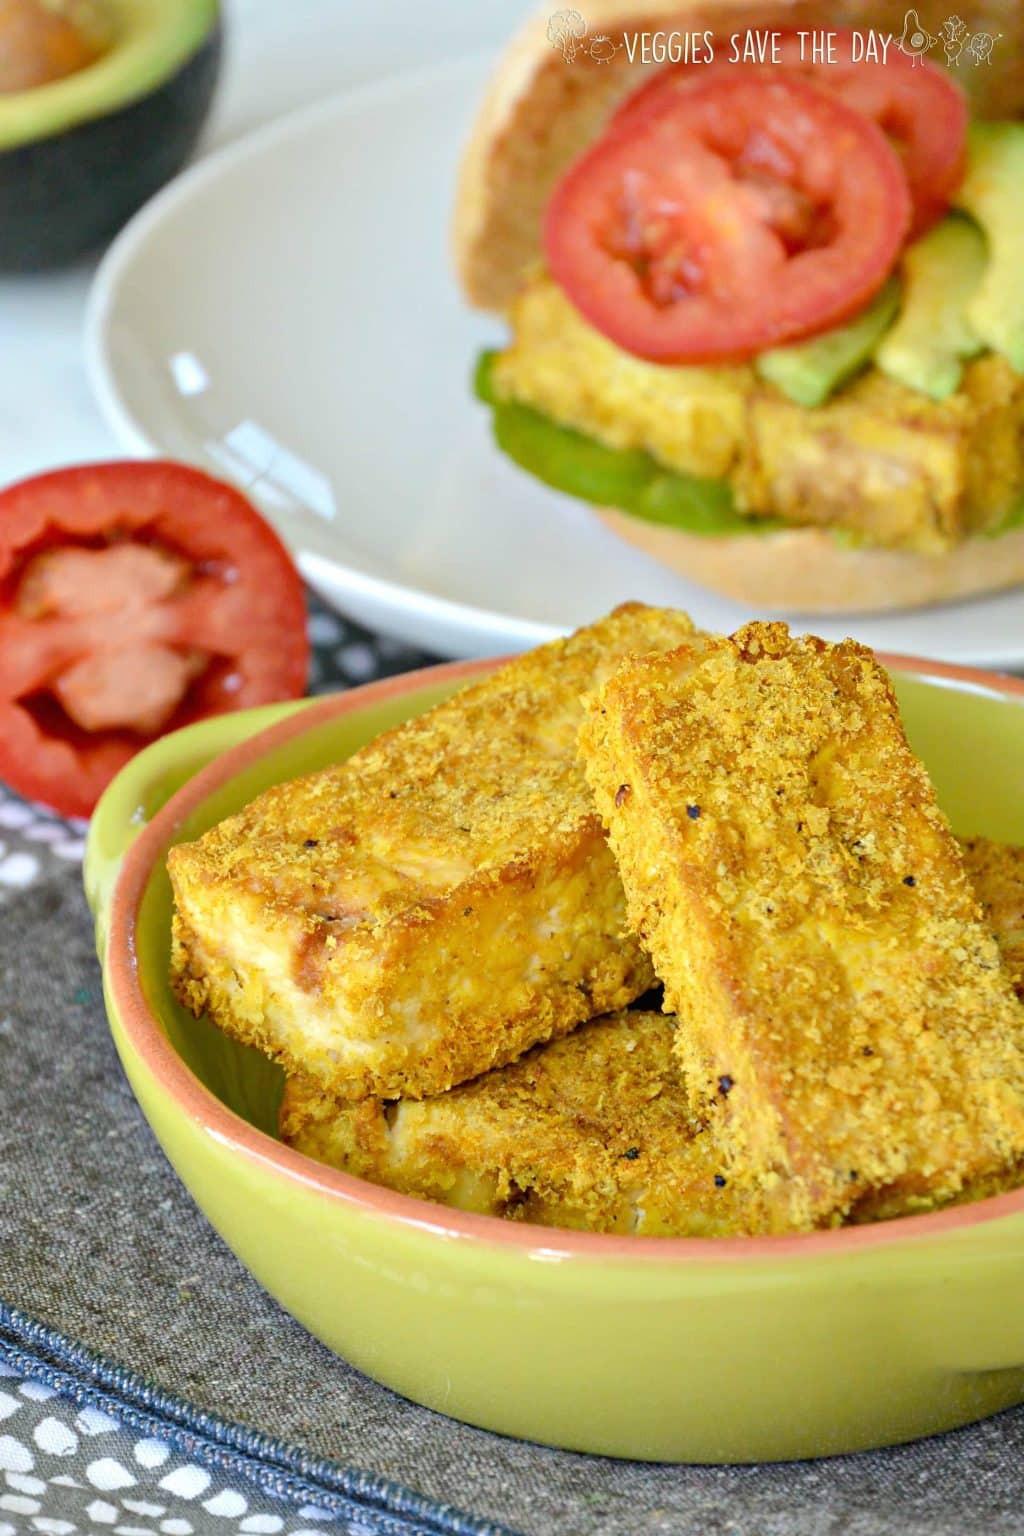 Tofu Breakfast Recipes  Breakfast Tofu The No Meat Athlete Cookbook Veggies